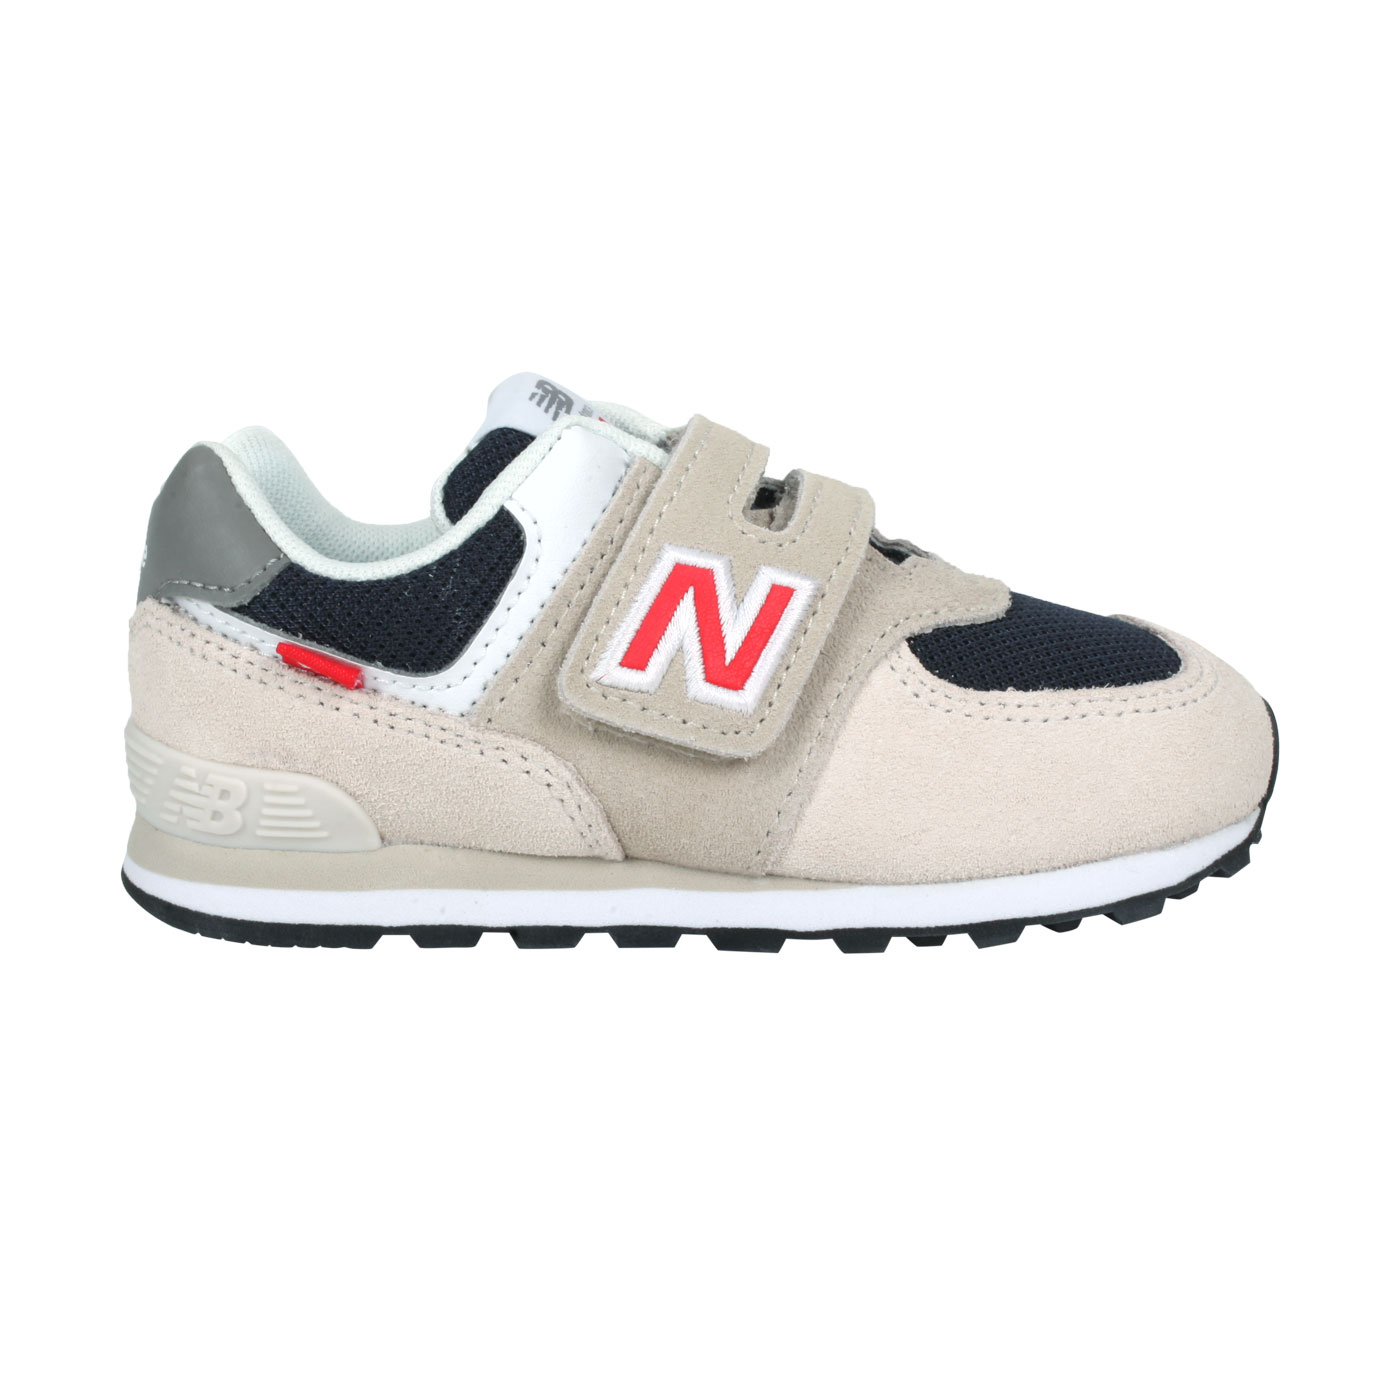 NEW BALANCE 小童休閒運動鞋-WIDE IV574SJ2 - 淺奶茶紅灰